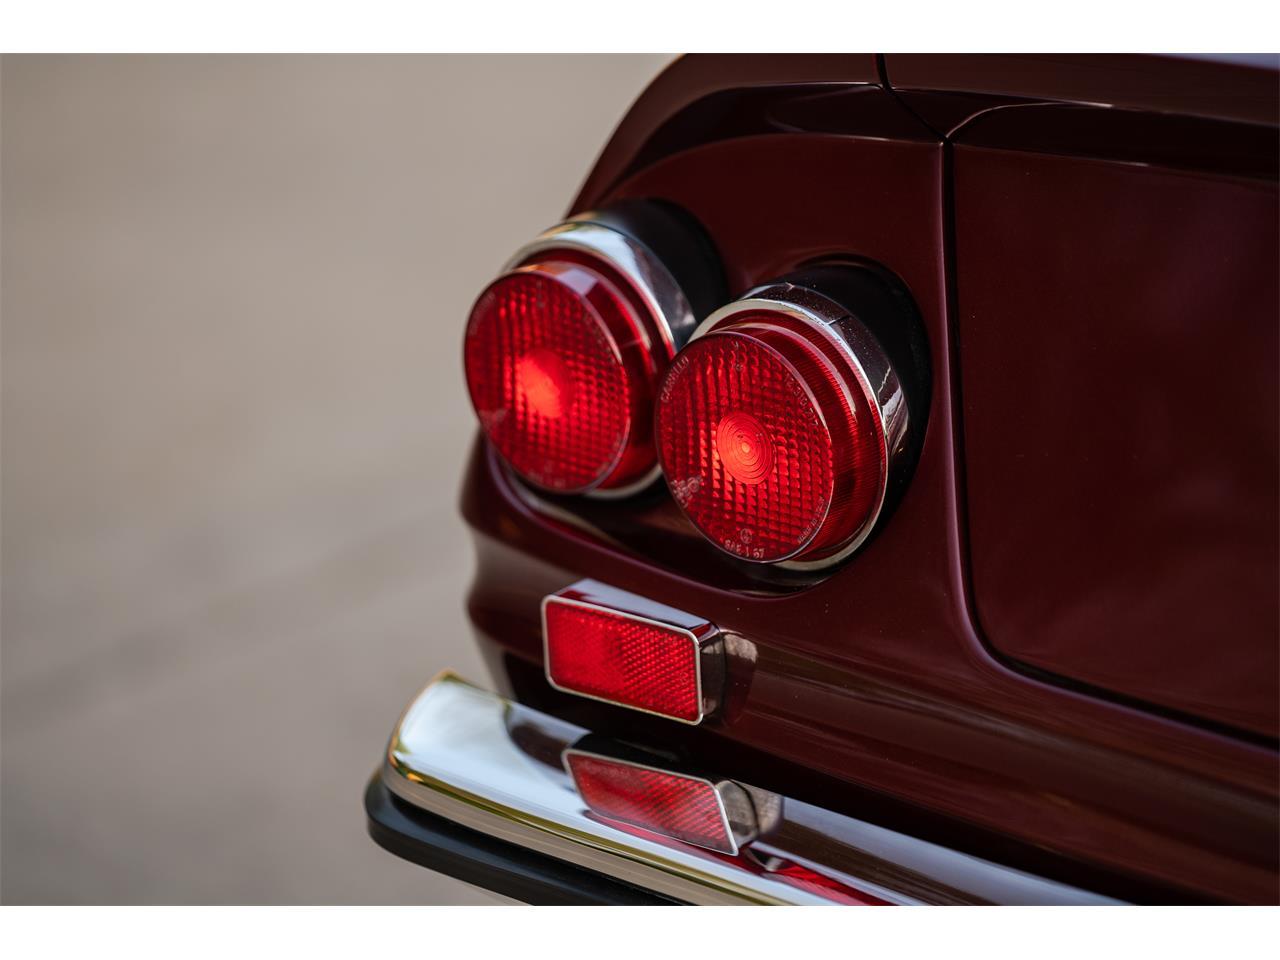 Large Picture of '72 365 GTB/4 Daytona - $725,000.00 - QL32